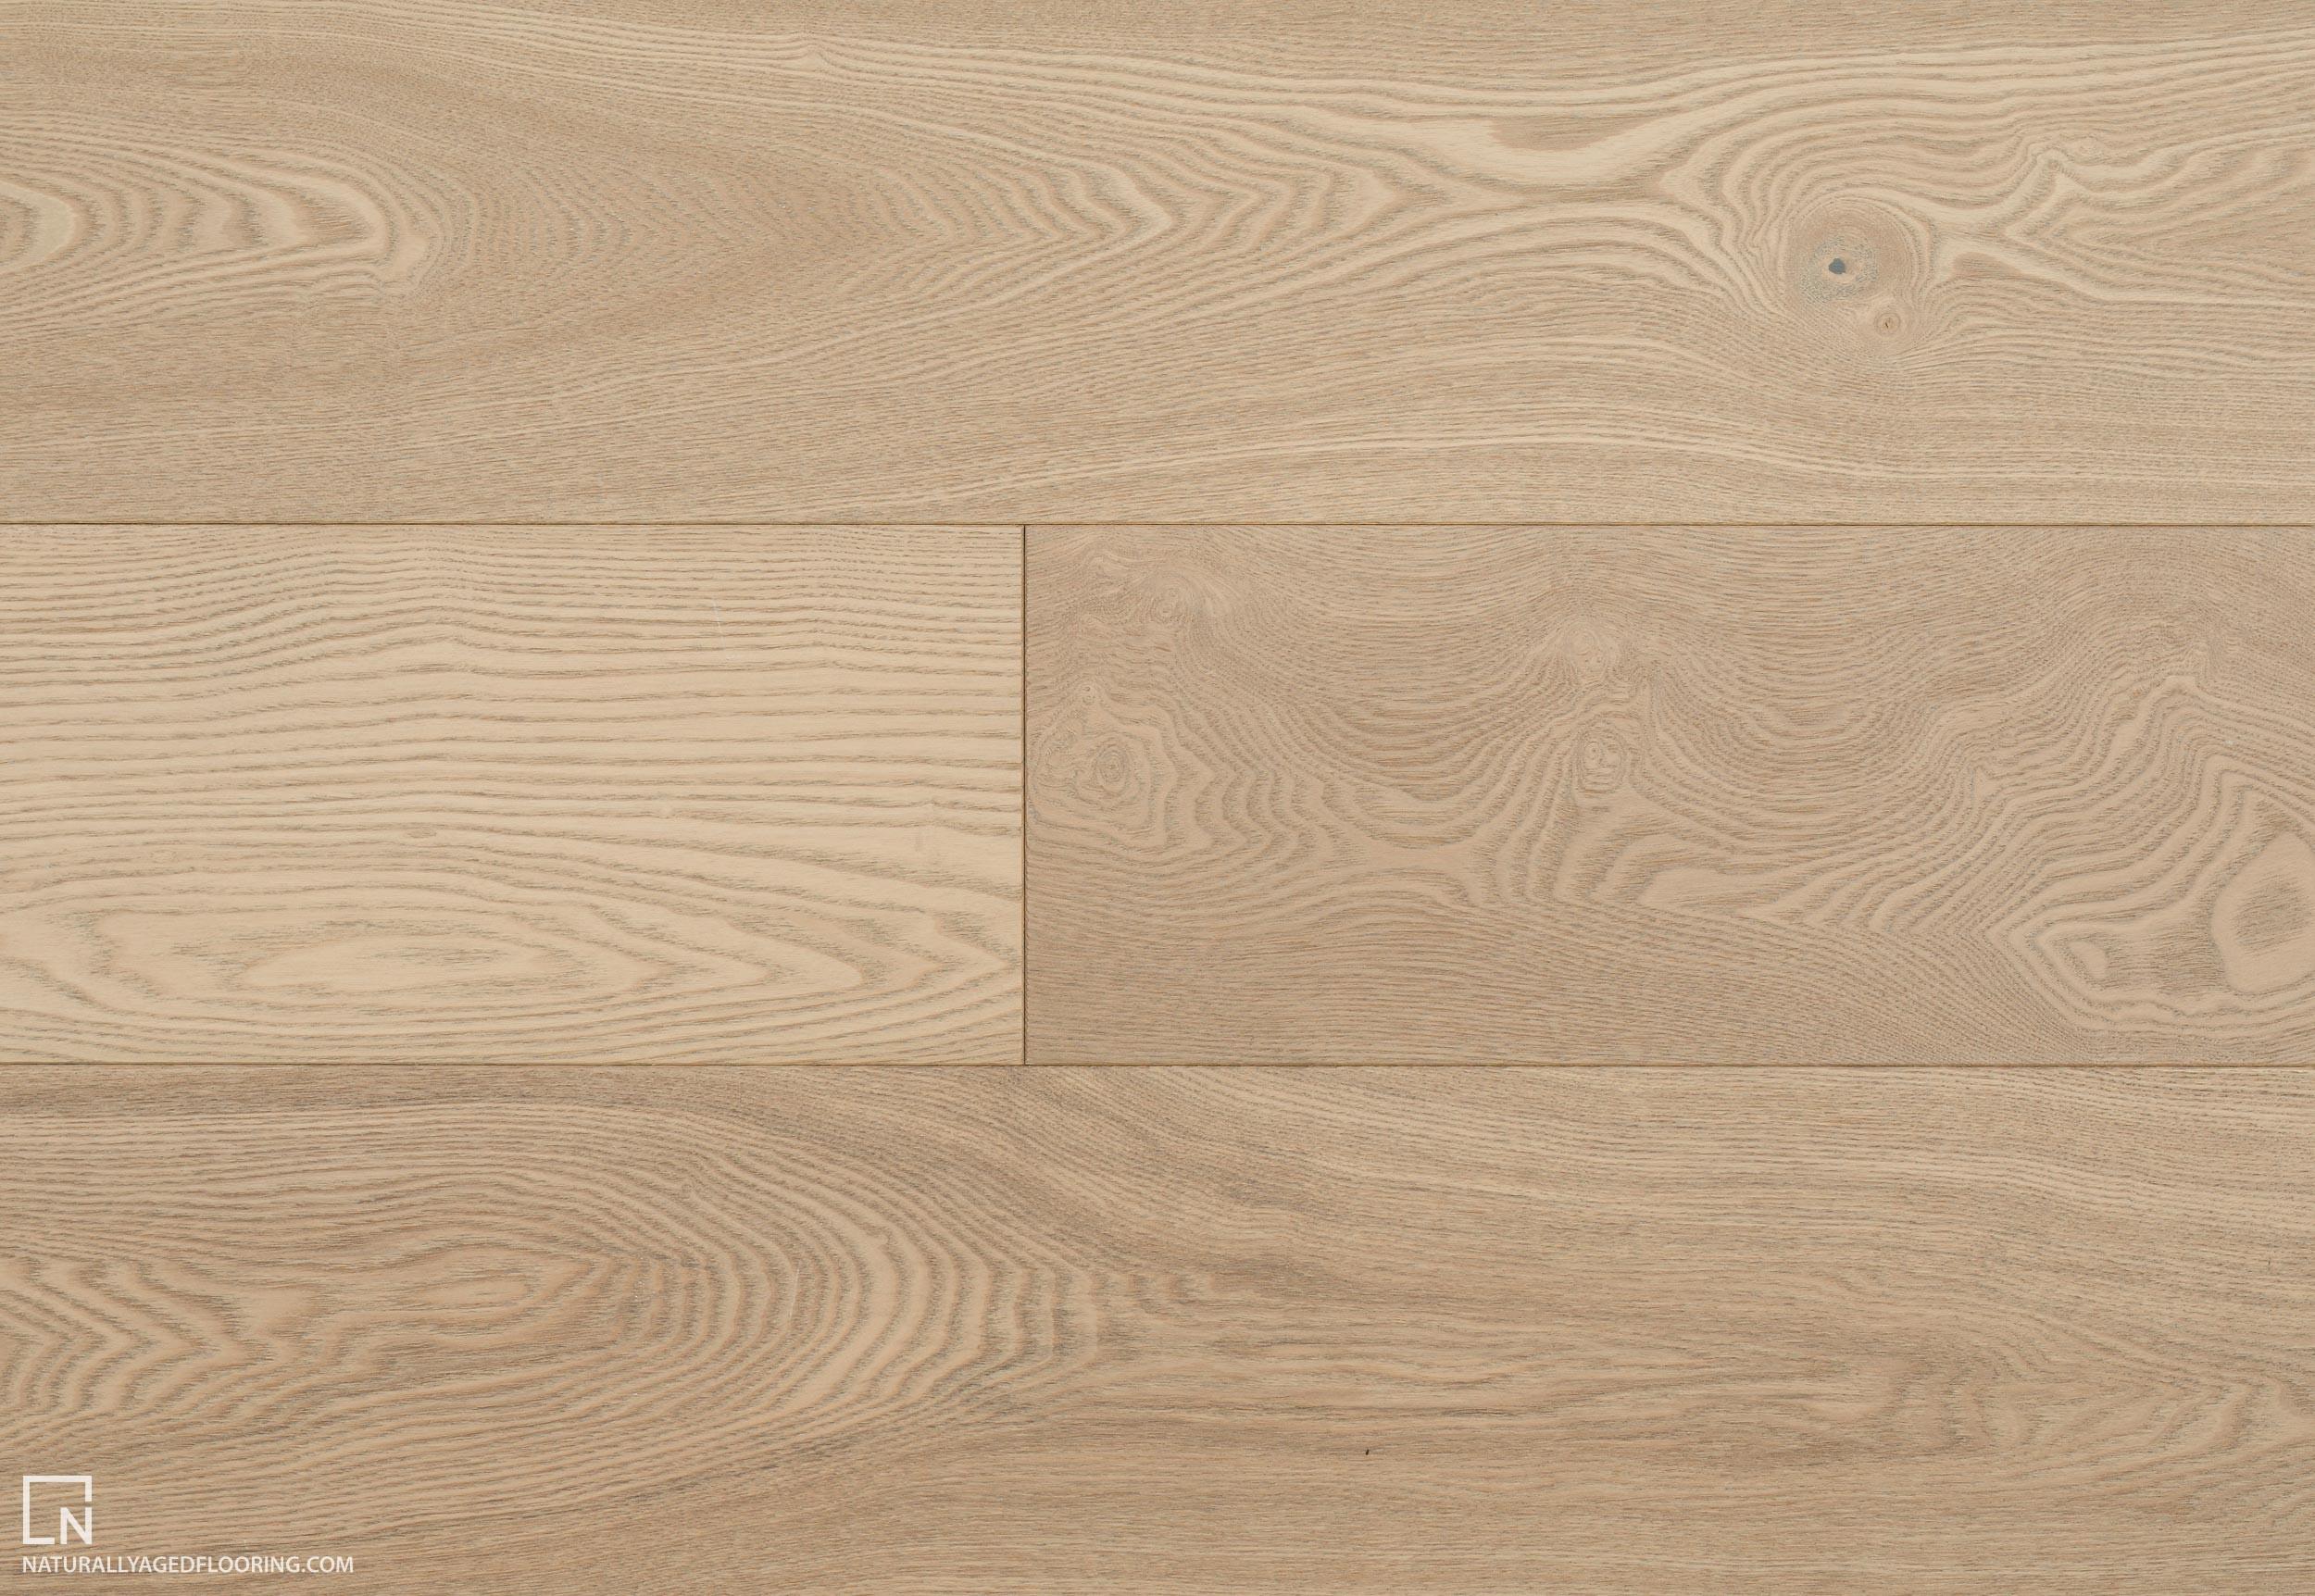 Blue Ridge Naturally Aged Flooring, Blue Ridge Premium Laminate Flooring